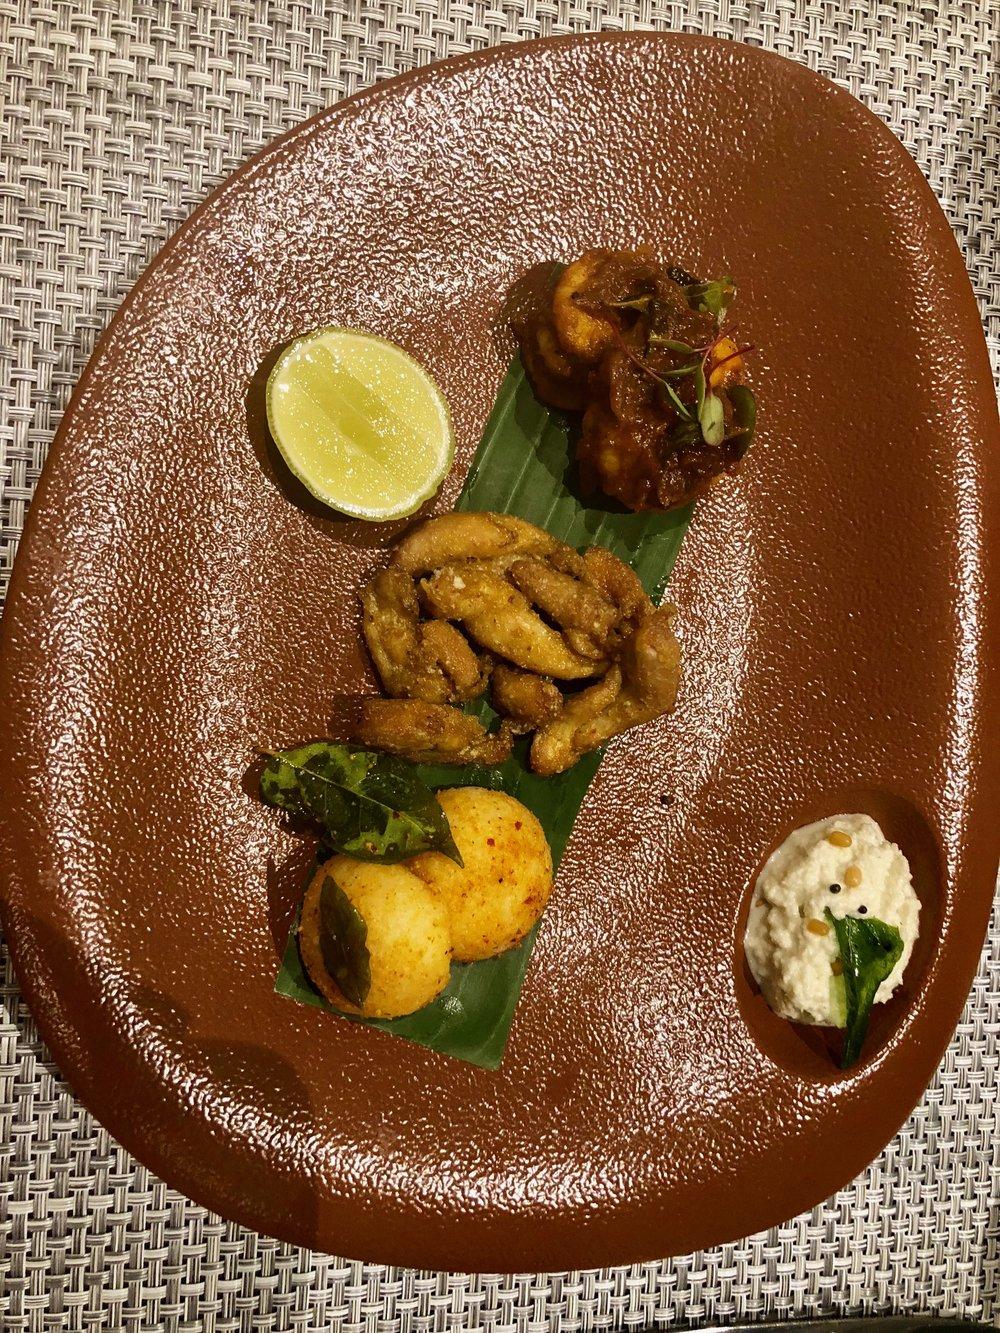 Journeys Rediscovered Inda Food Image 2.jpeg